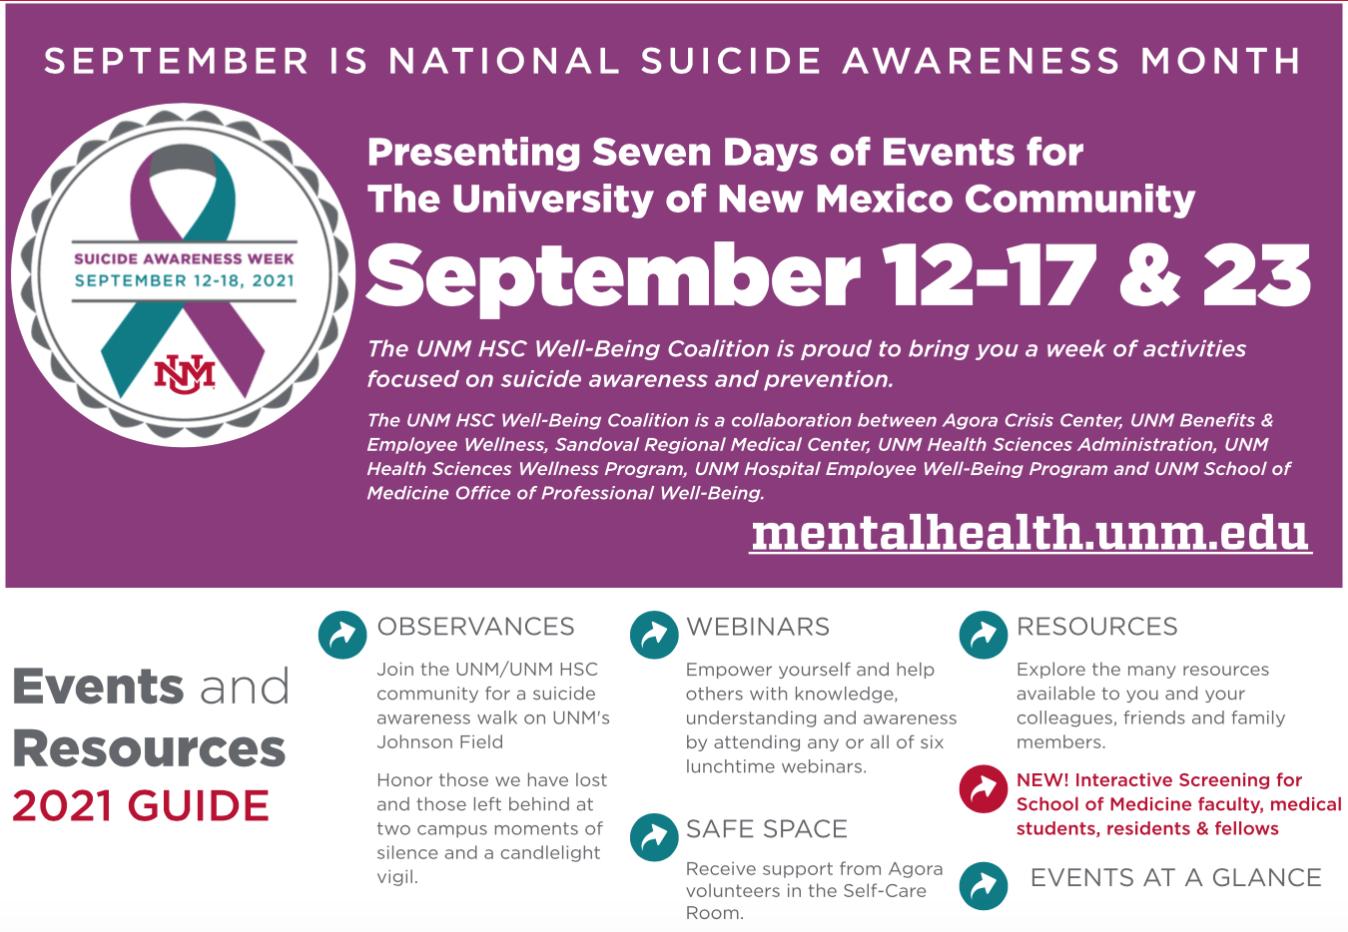 Semaine de sensibilisation au suicide 2021